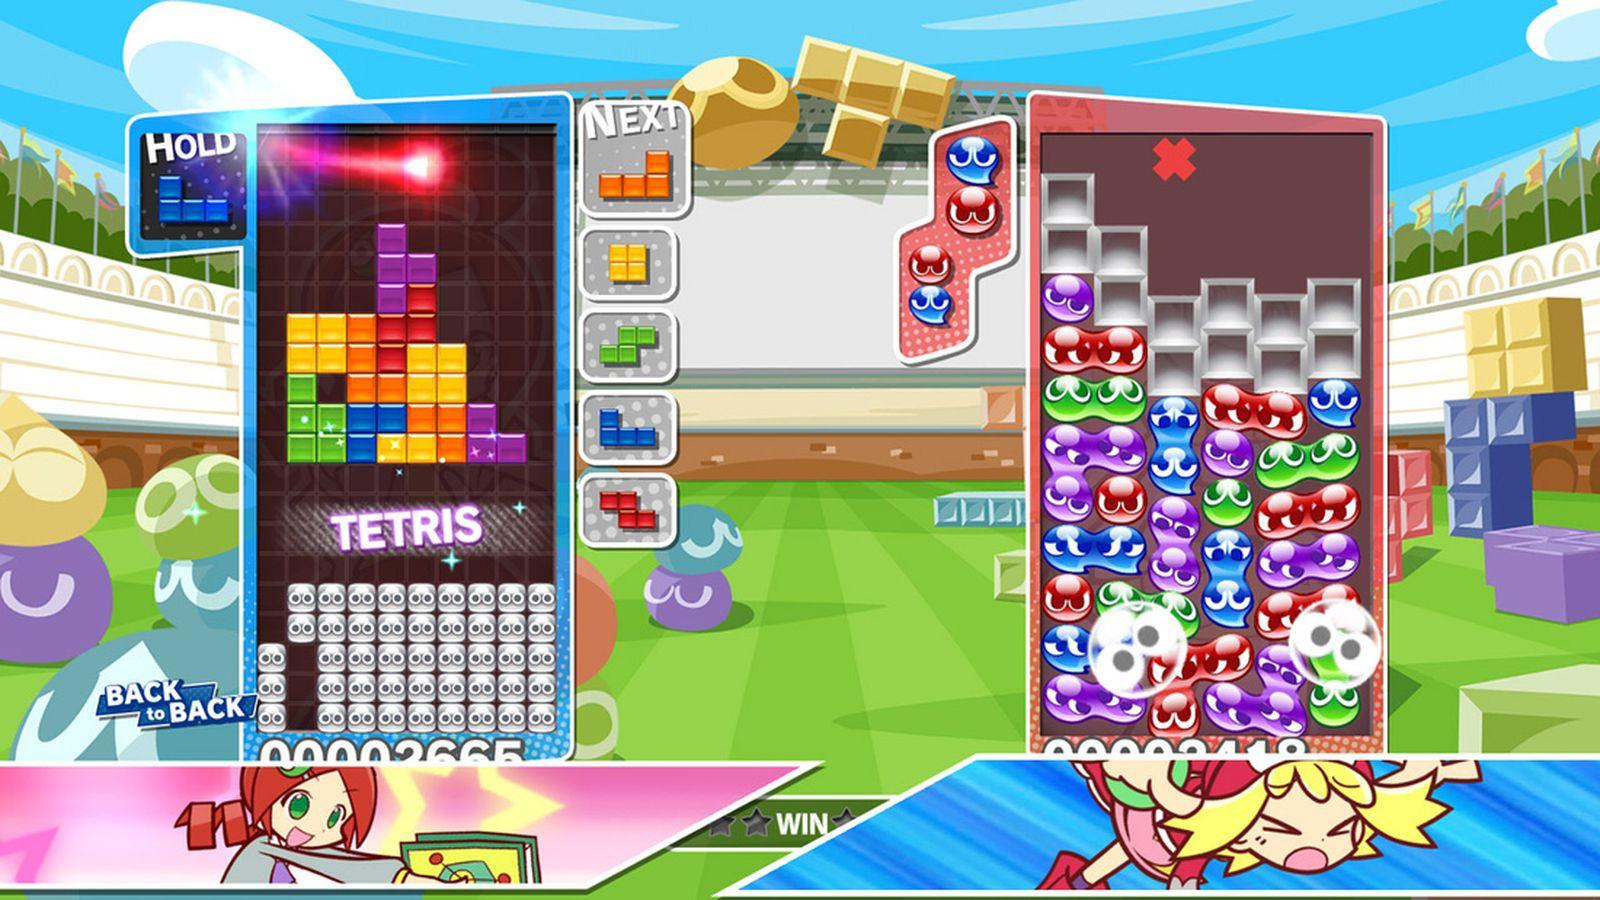 Puyo Puyo Tetris's physical Nintendo Switch version costs $10 more than eShop, PS4